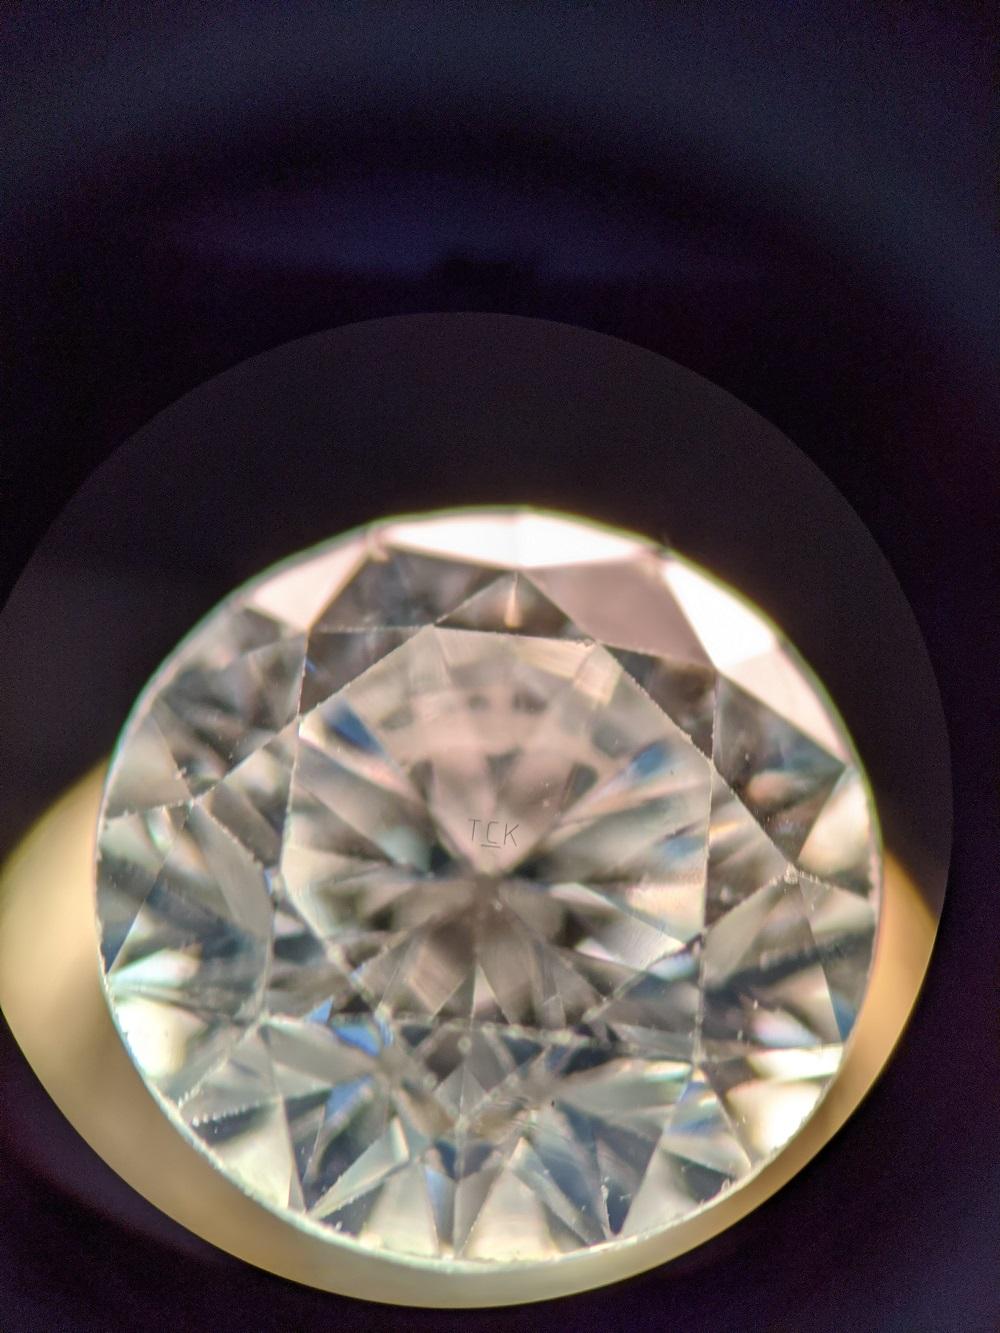 Opsydia technology advances to secure identity of melee diamonds